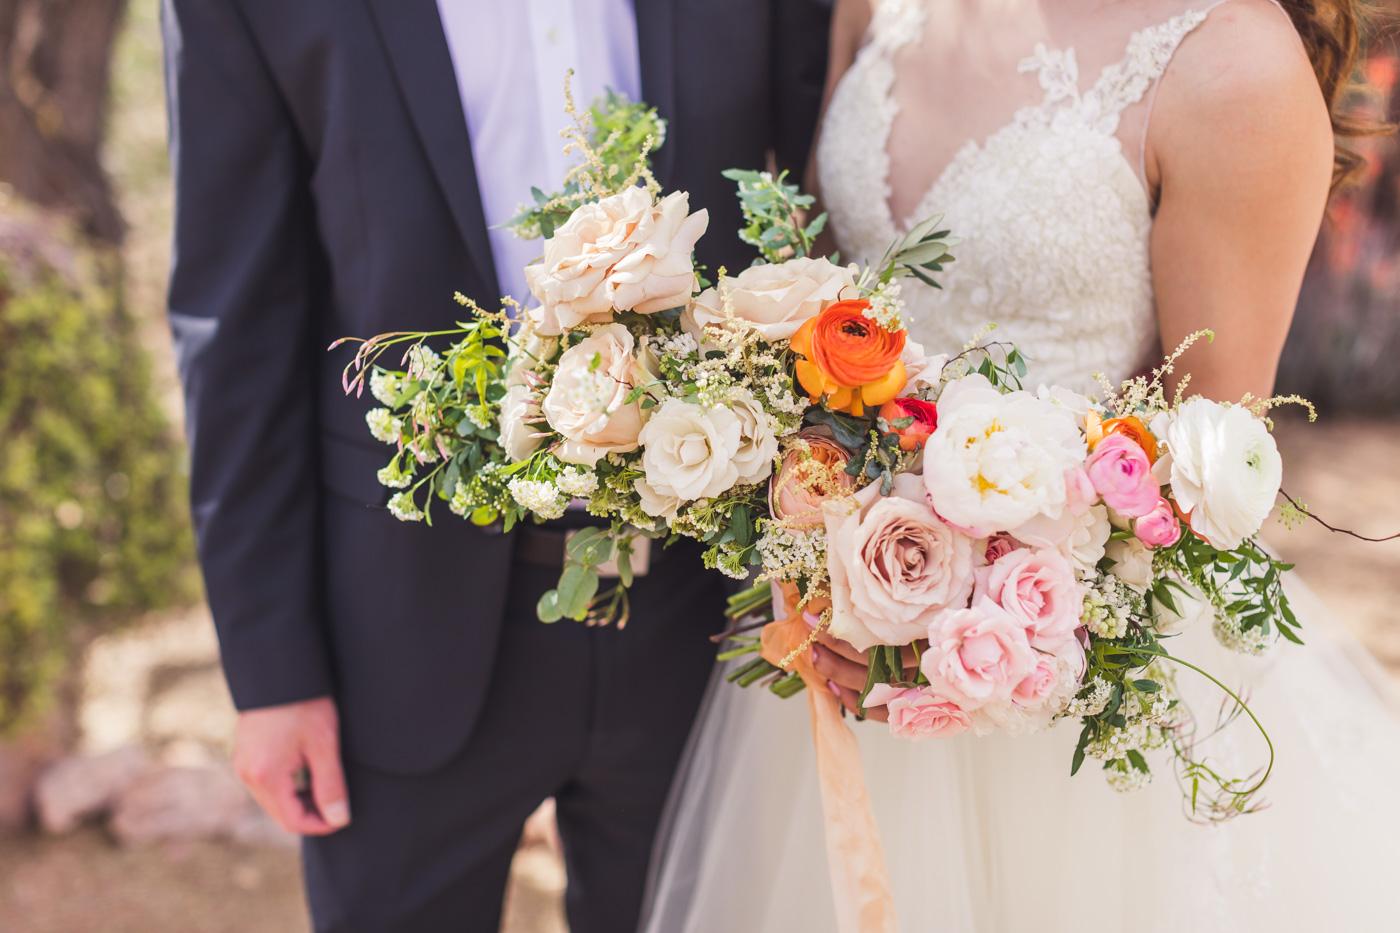 wedding-bouquet-details